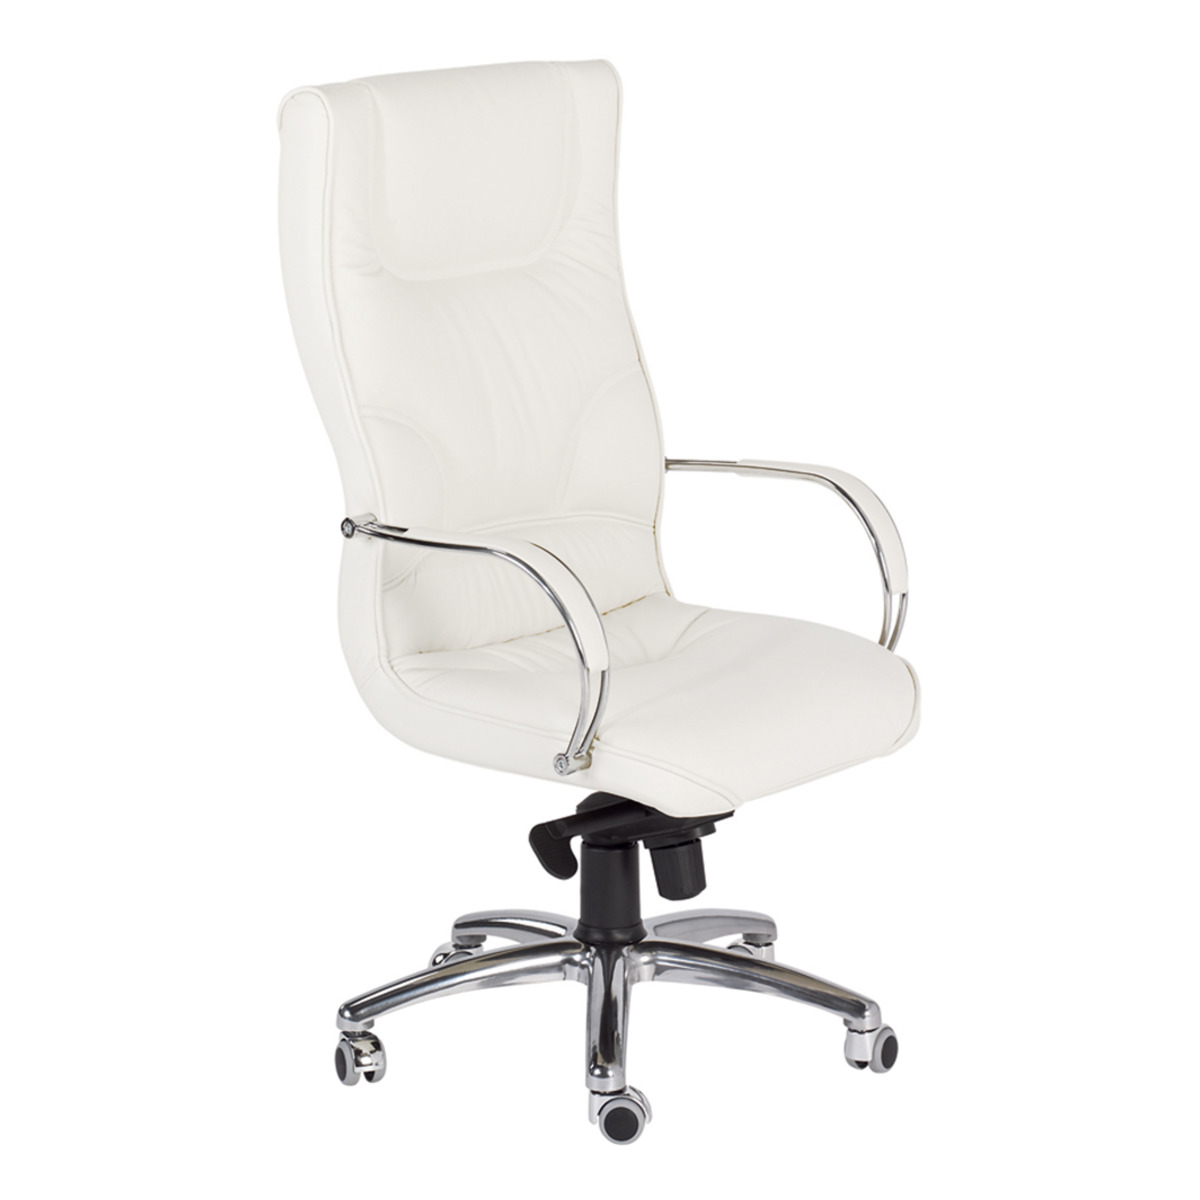 El corte ingles sillas de oficina cheap silla de comedor for Muebles de oficina el corte ingles